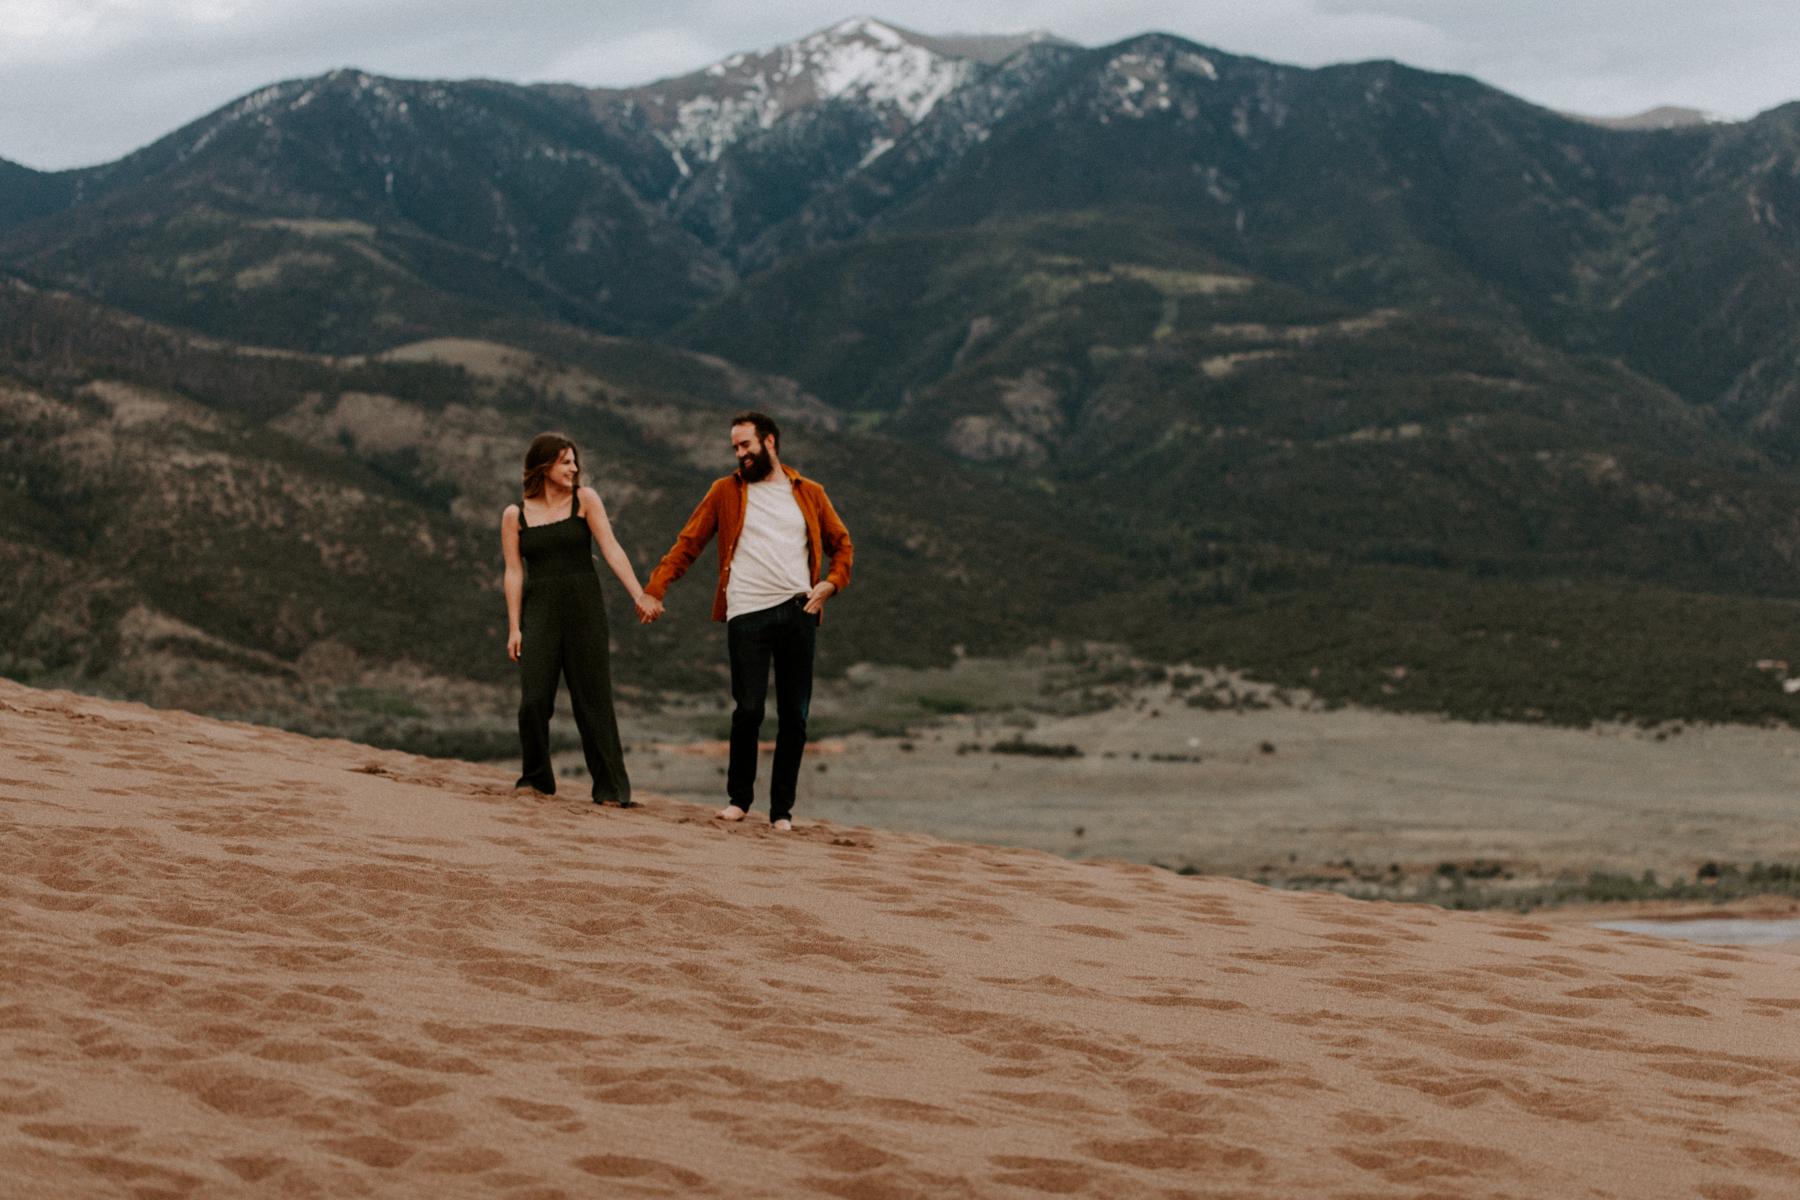 S + J Great Sand Dunes National Park Engagement Photography Photographer Wedding Alamosa Colorado-46.jpg